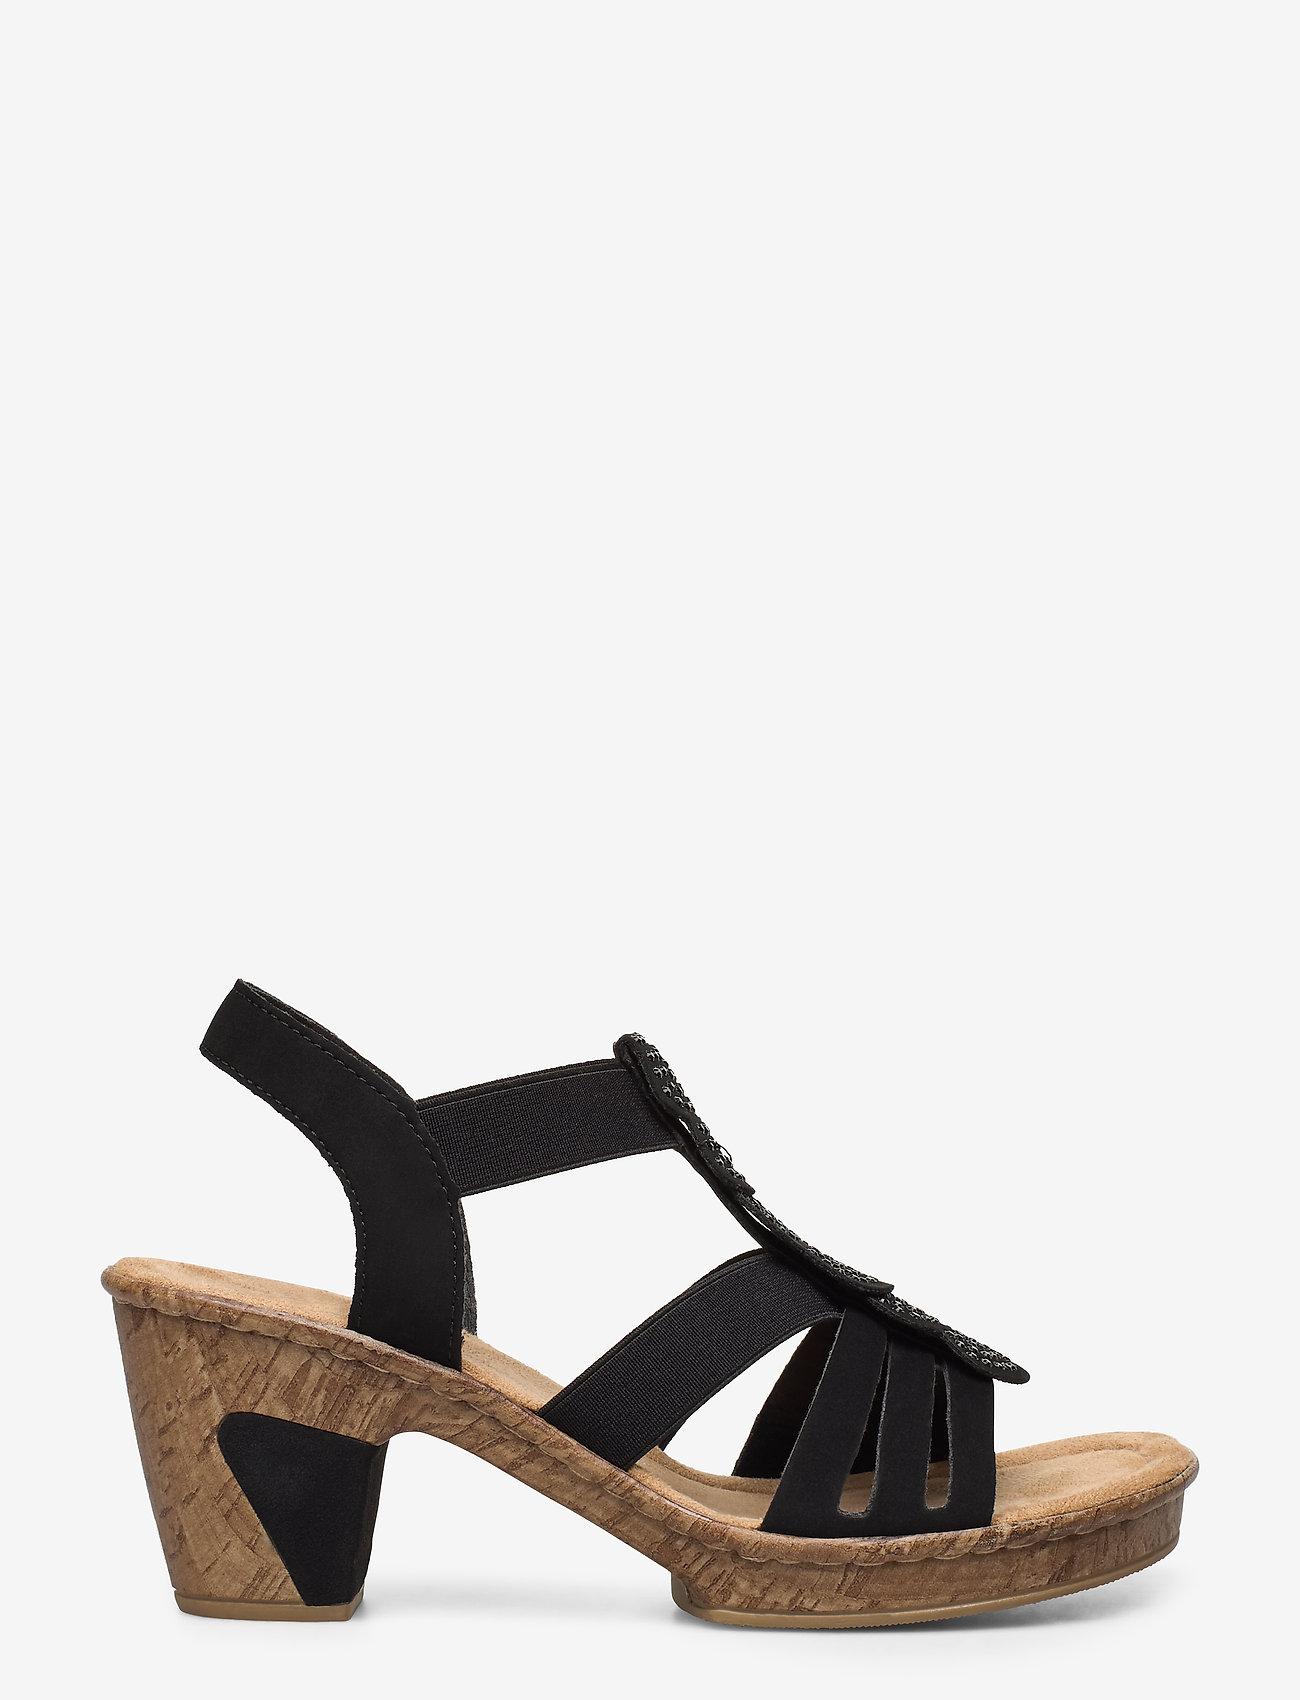 Rieker - 69702-00 - heeled sandals - black